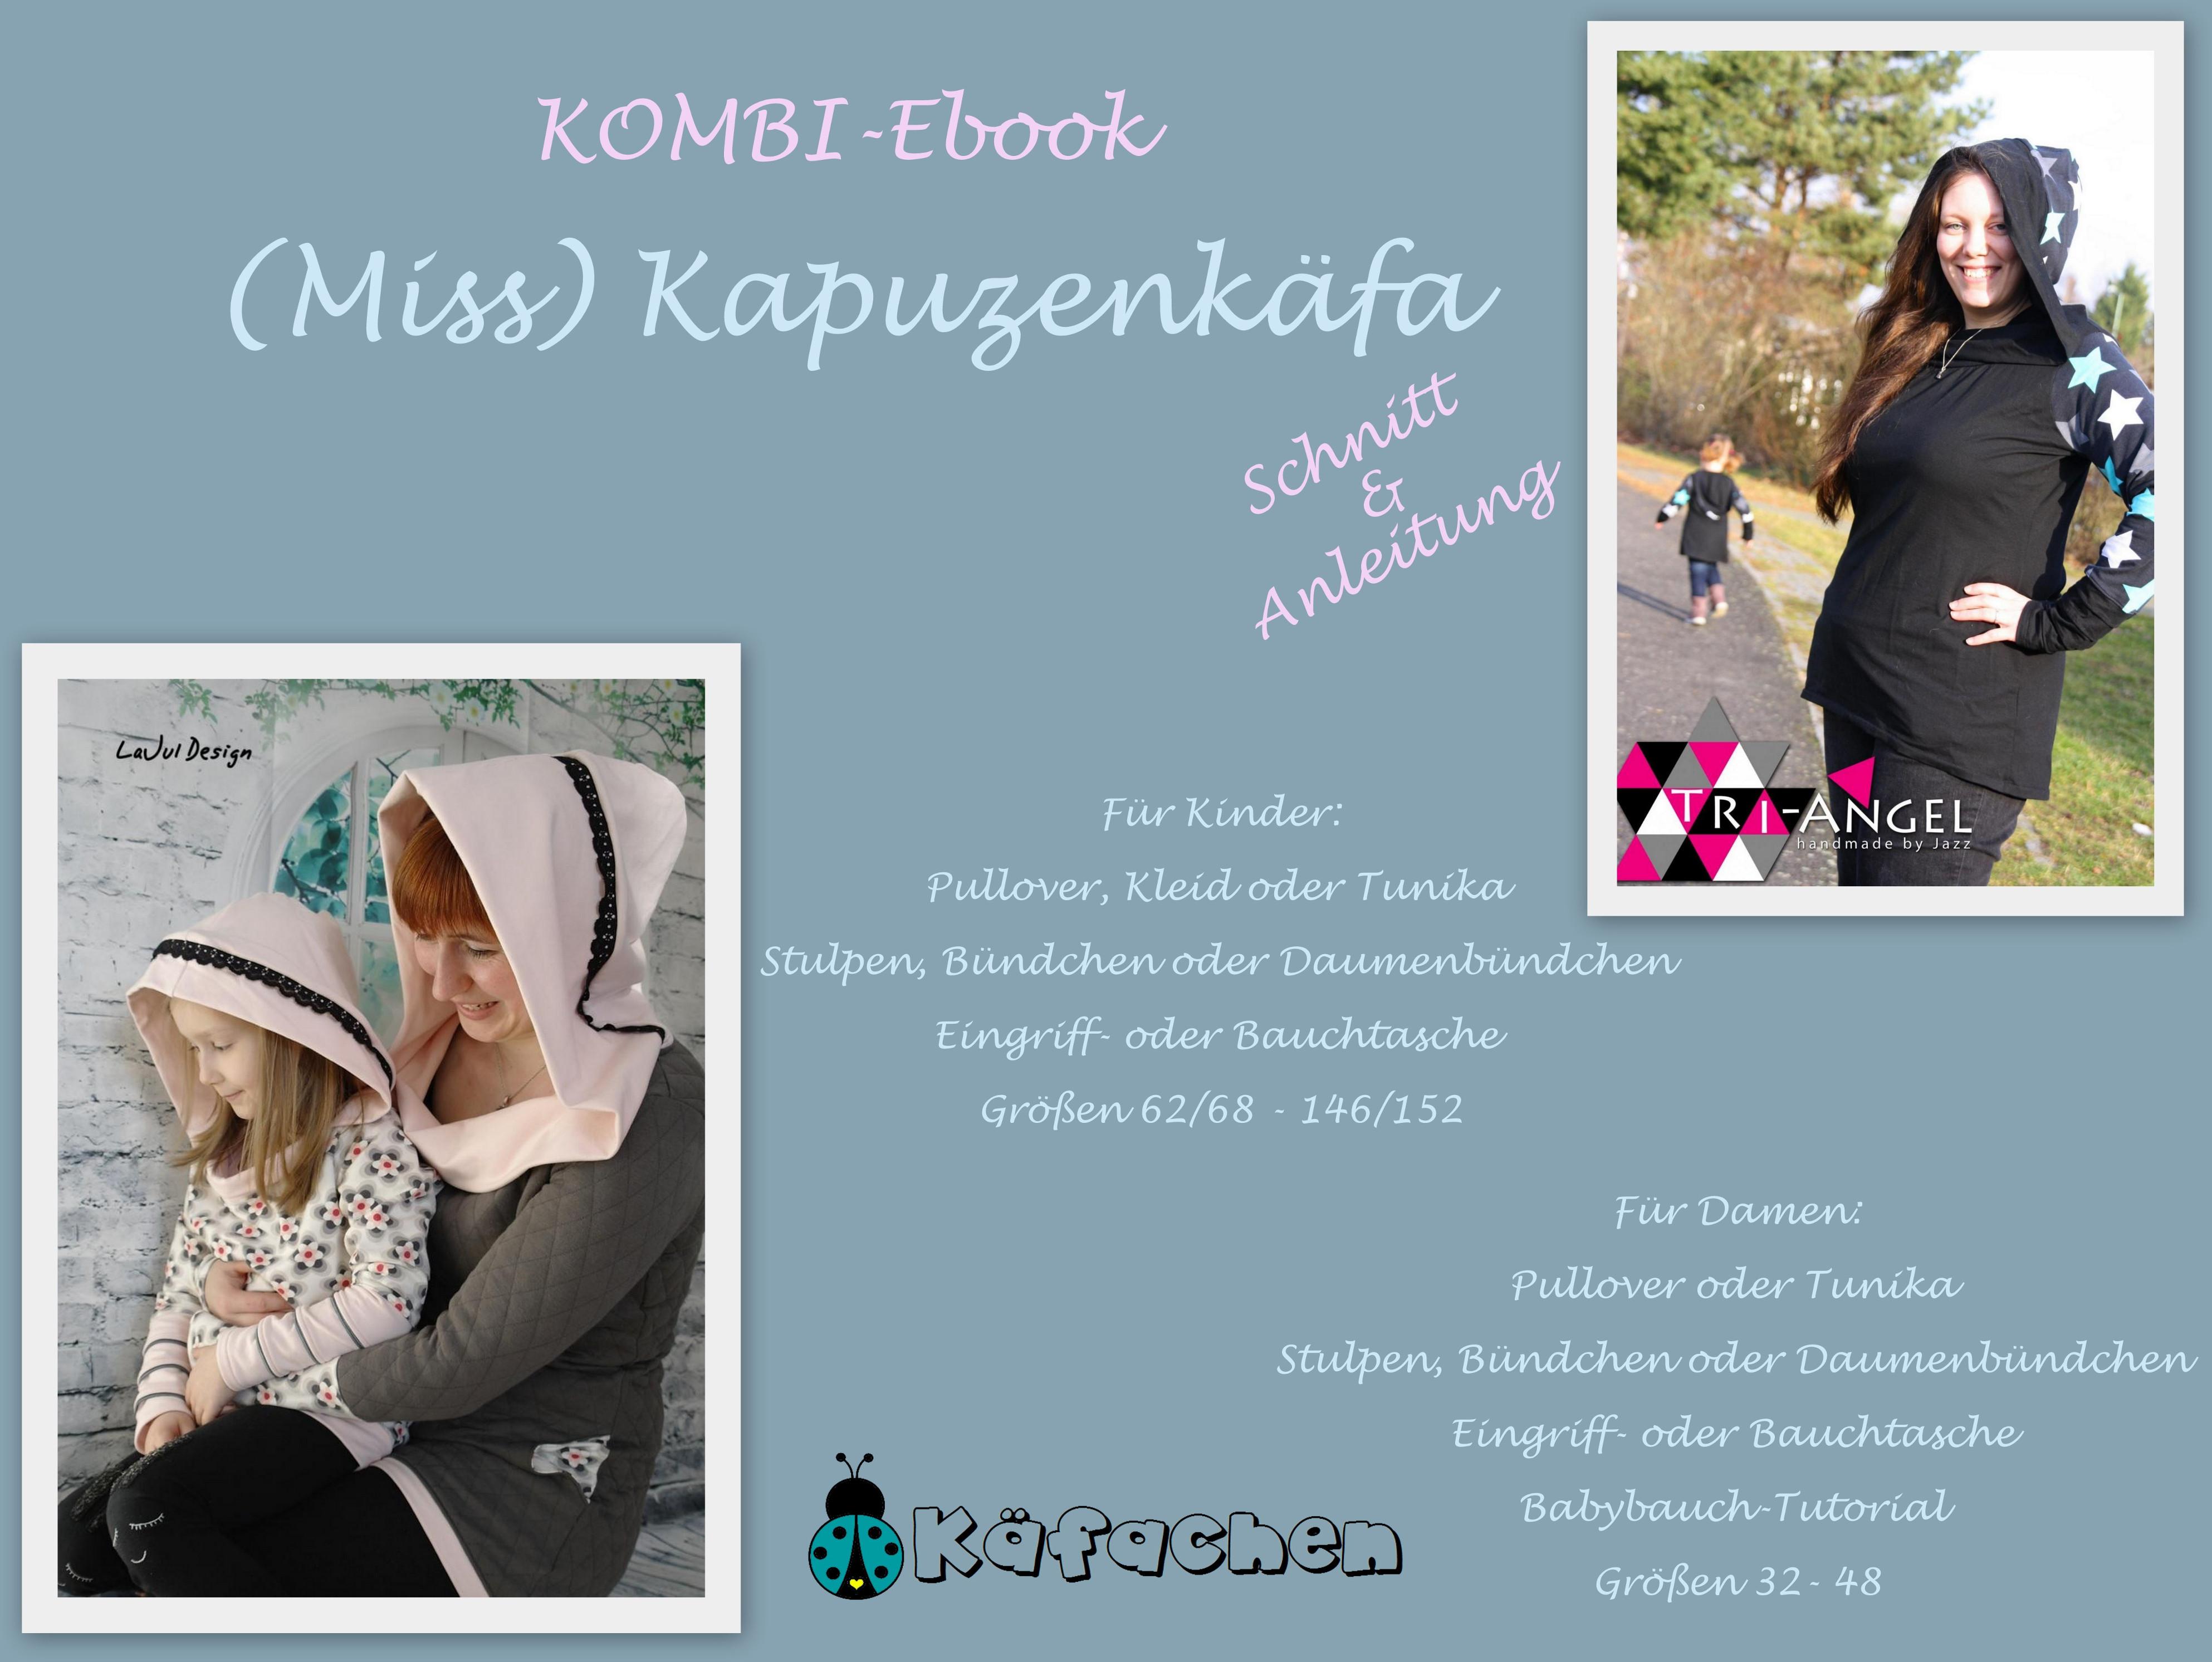 (Miss) Kapuzenkäfa KombiEbook